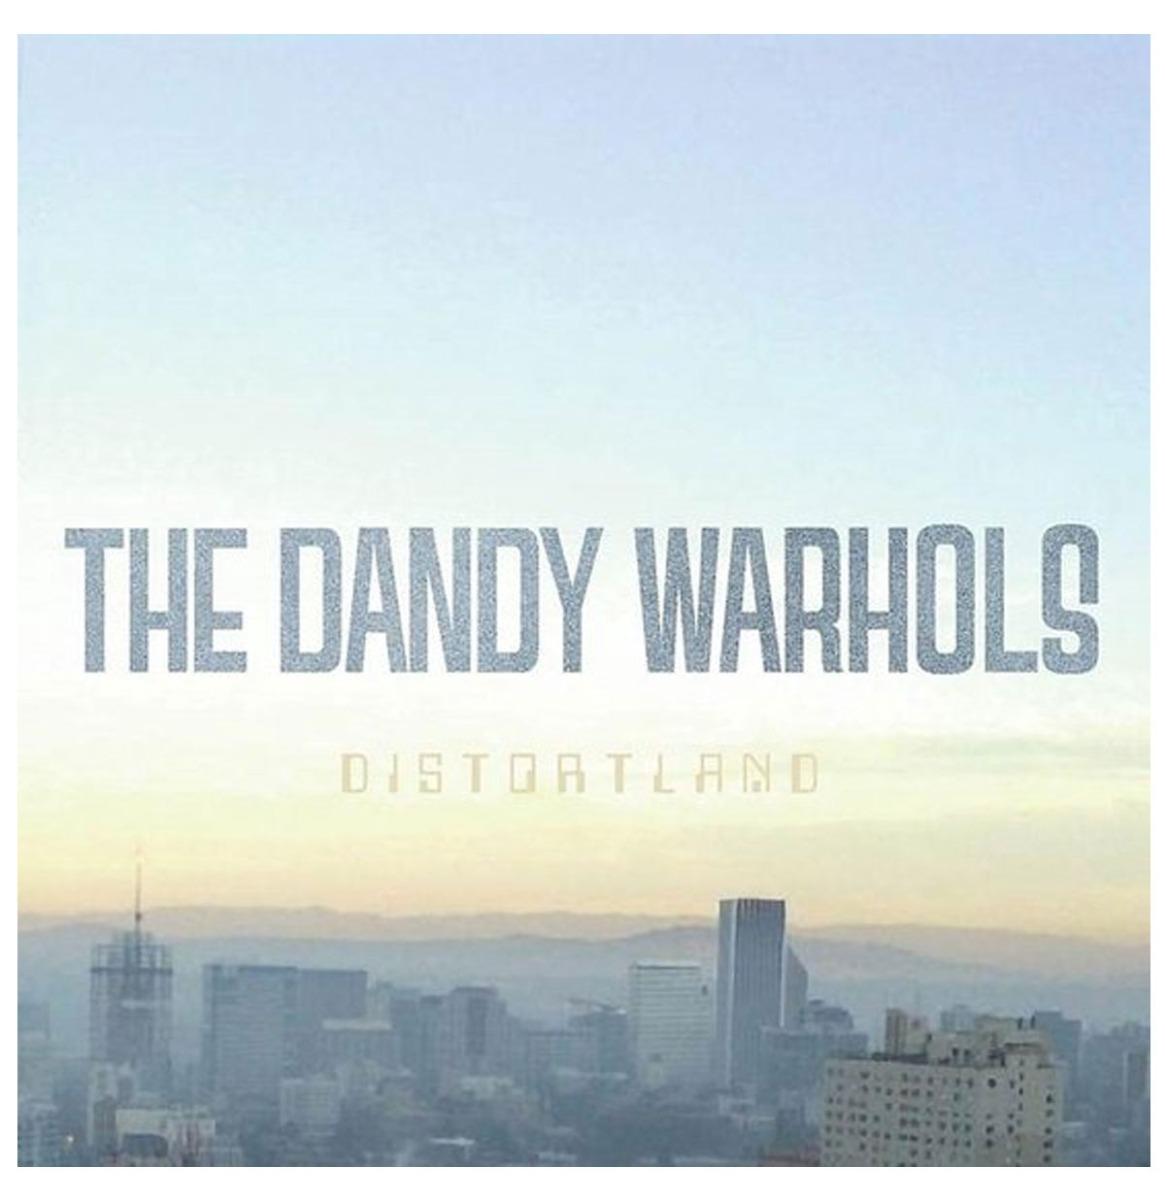 The Dandy Warhols - Distortland LP